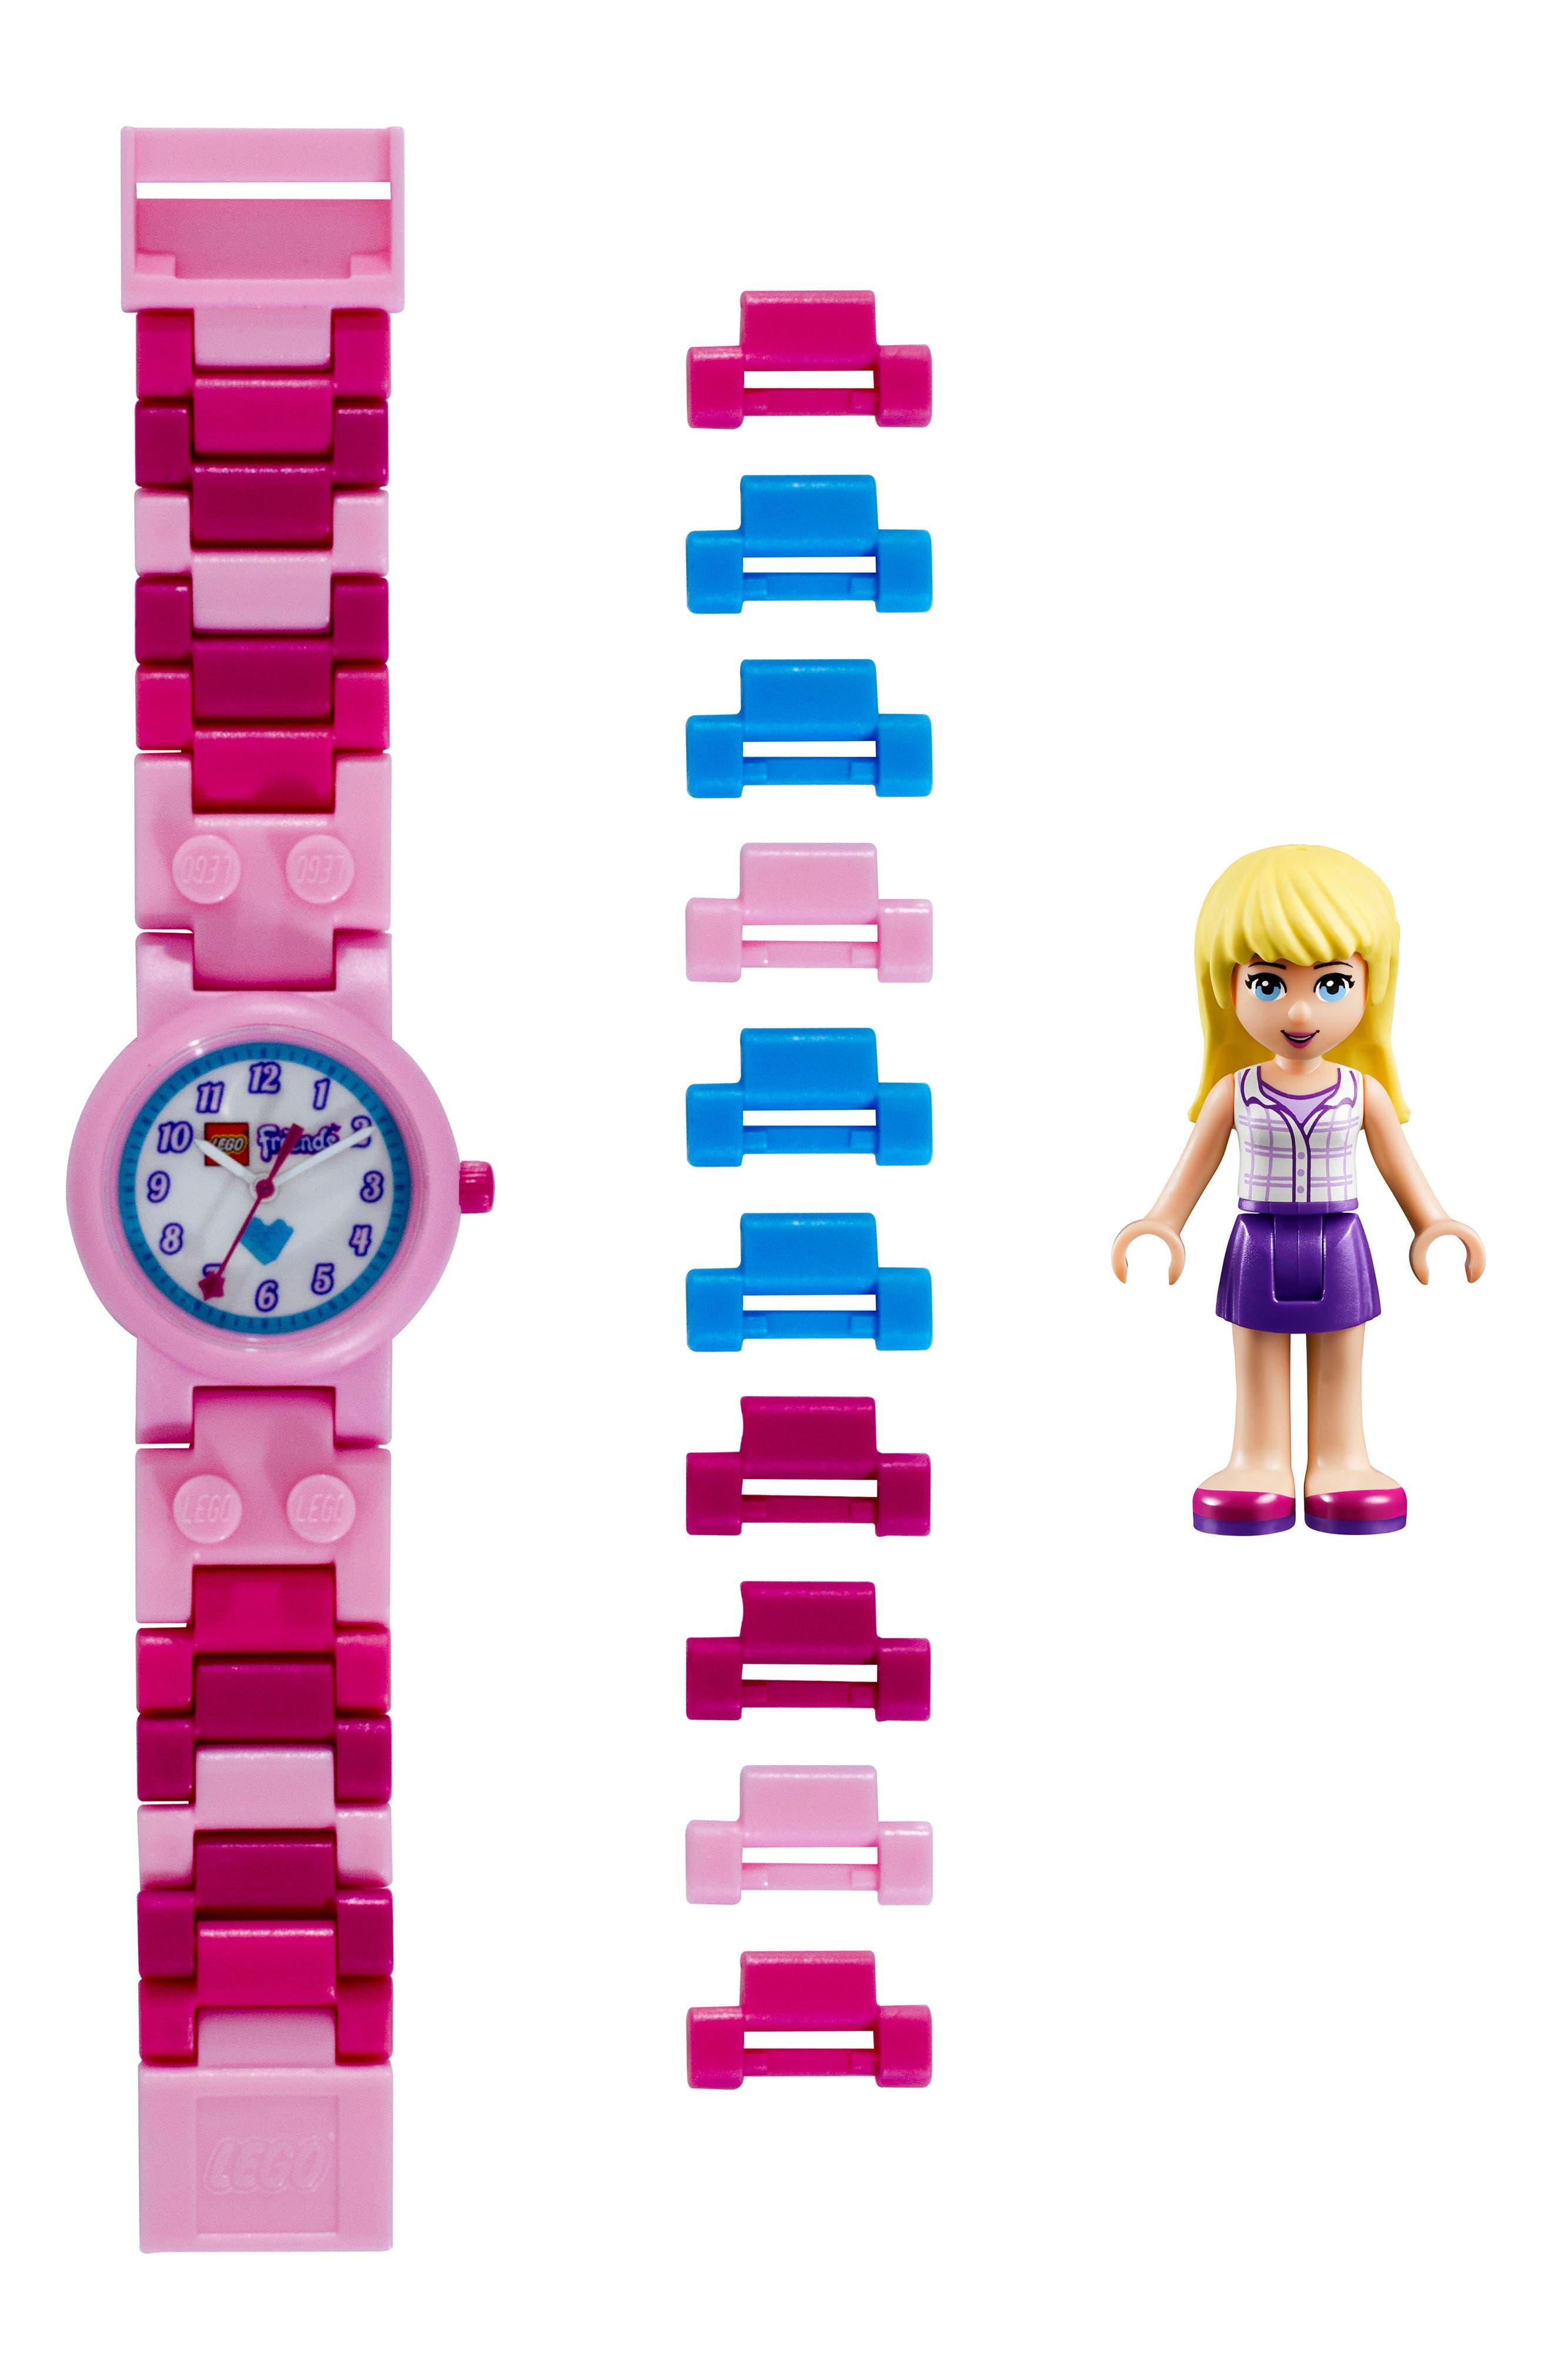 29-Piece LEGO Friends Stephanie Buildable Water-Resistant Watch & Figurine Set,                             Main thumbnail 1, color,                             650